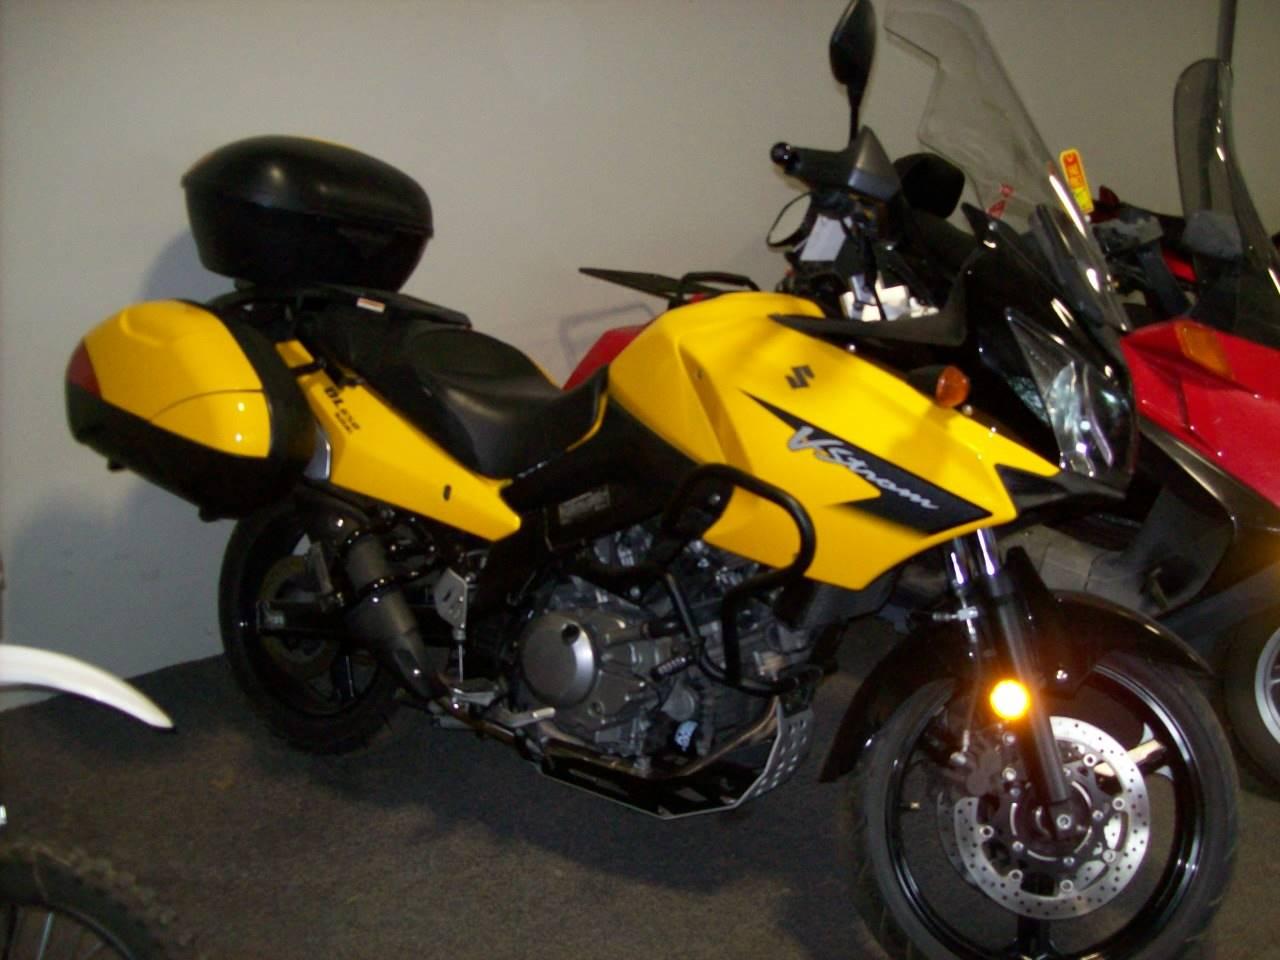 Used 2008 Suzuki V-Strom® 650 Motorcycles in Wisconsin Rapids, WI ...